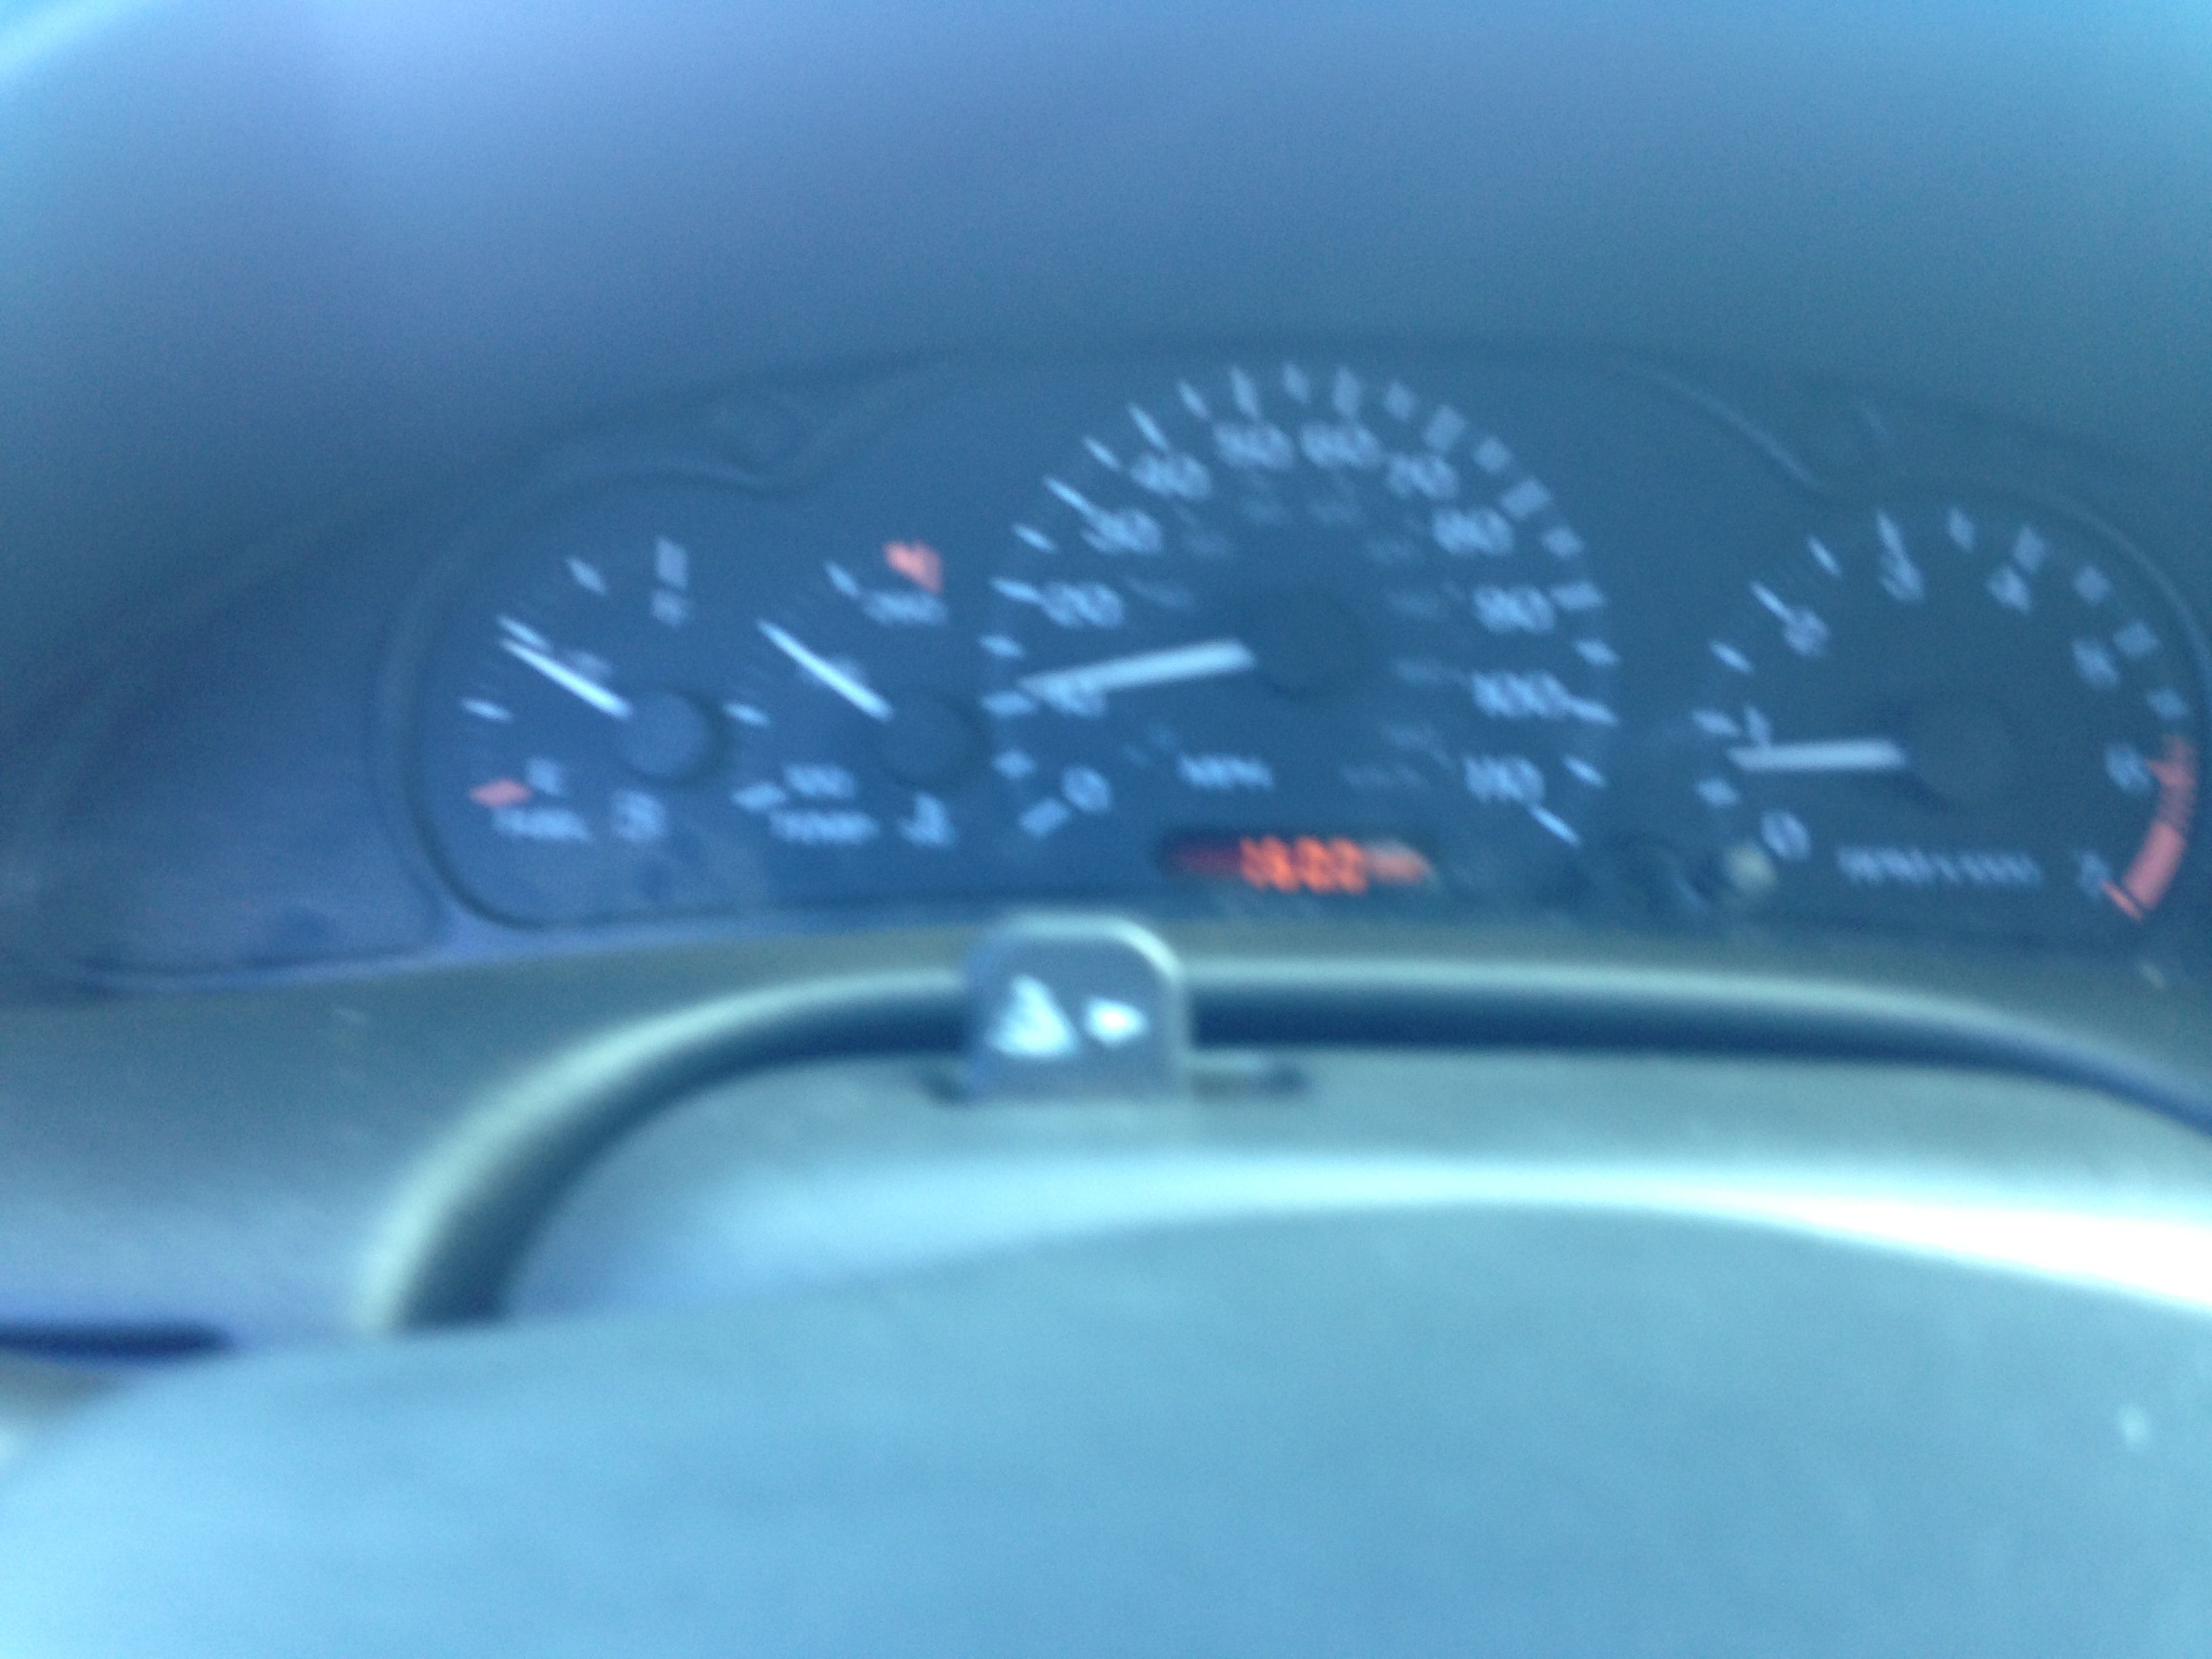 2002 Chevy cavalier , tune 1.